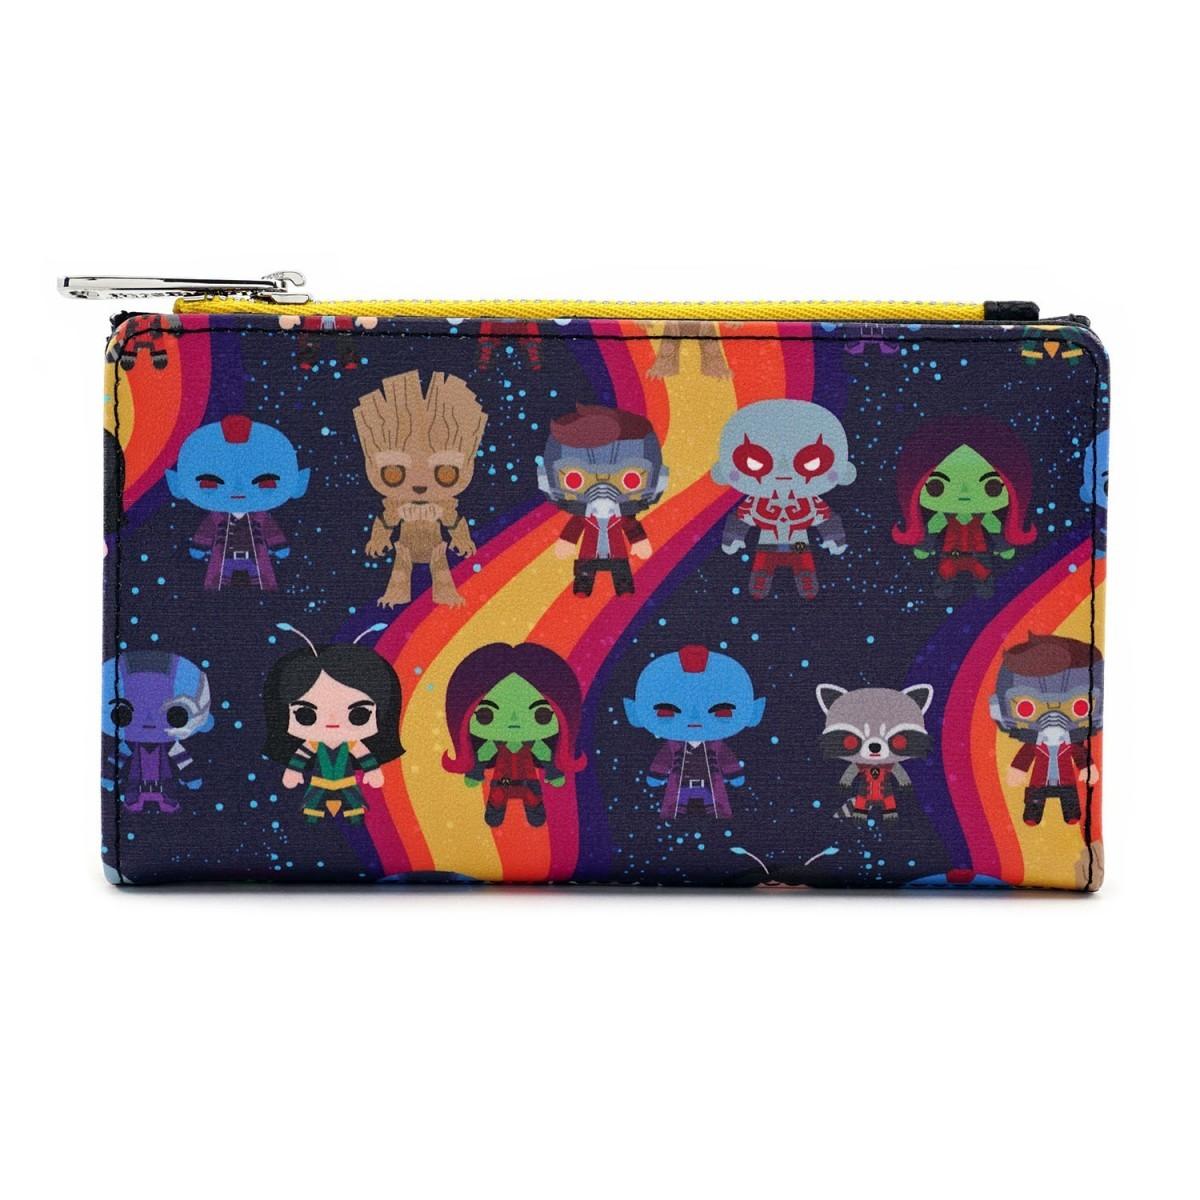 Loungefly: Guardians Of The Galaxy 2 Purse - Chibi image